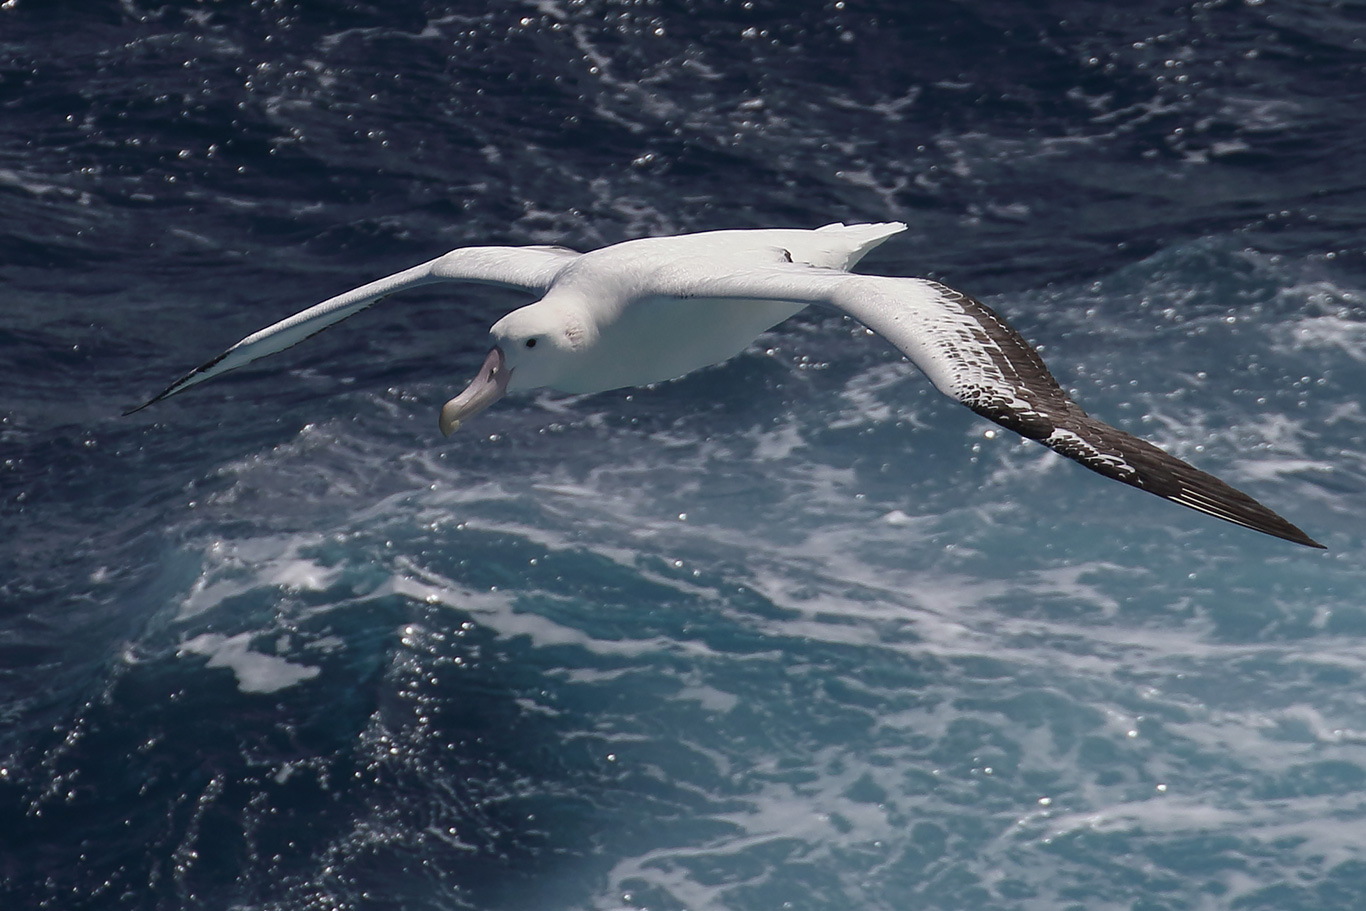 Wandering Albatross, At sea, c. 600km east of Argentina, north of The Falklands, South Atlantic Ocean.